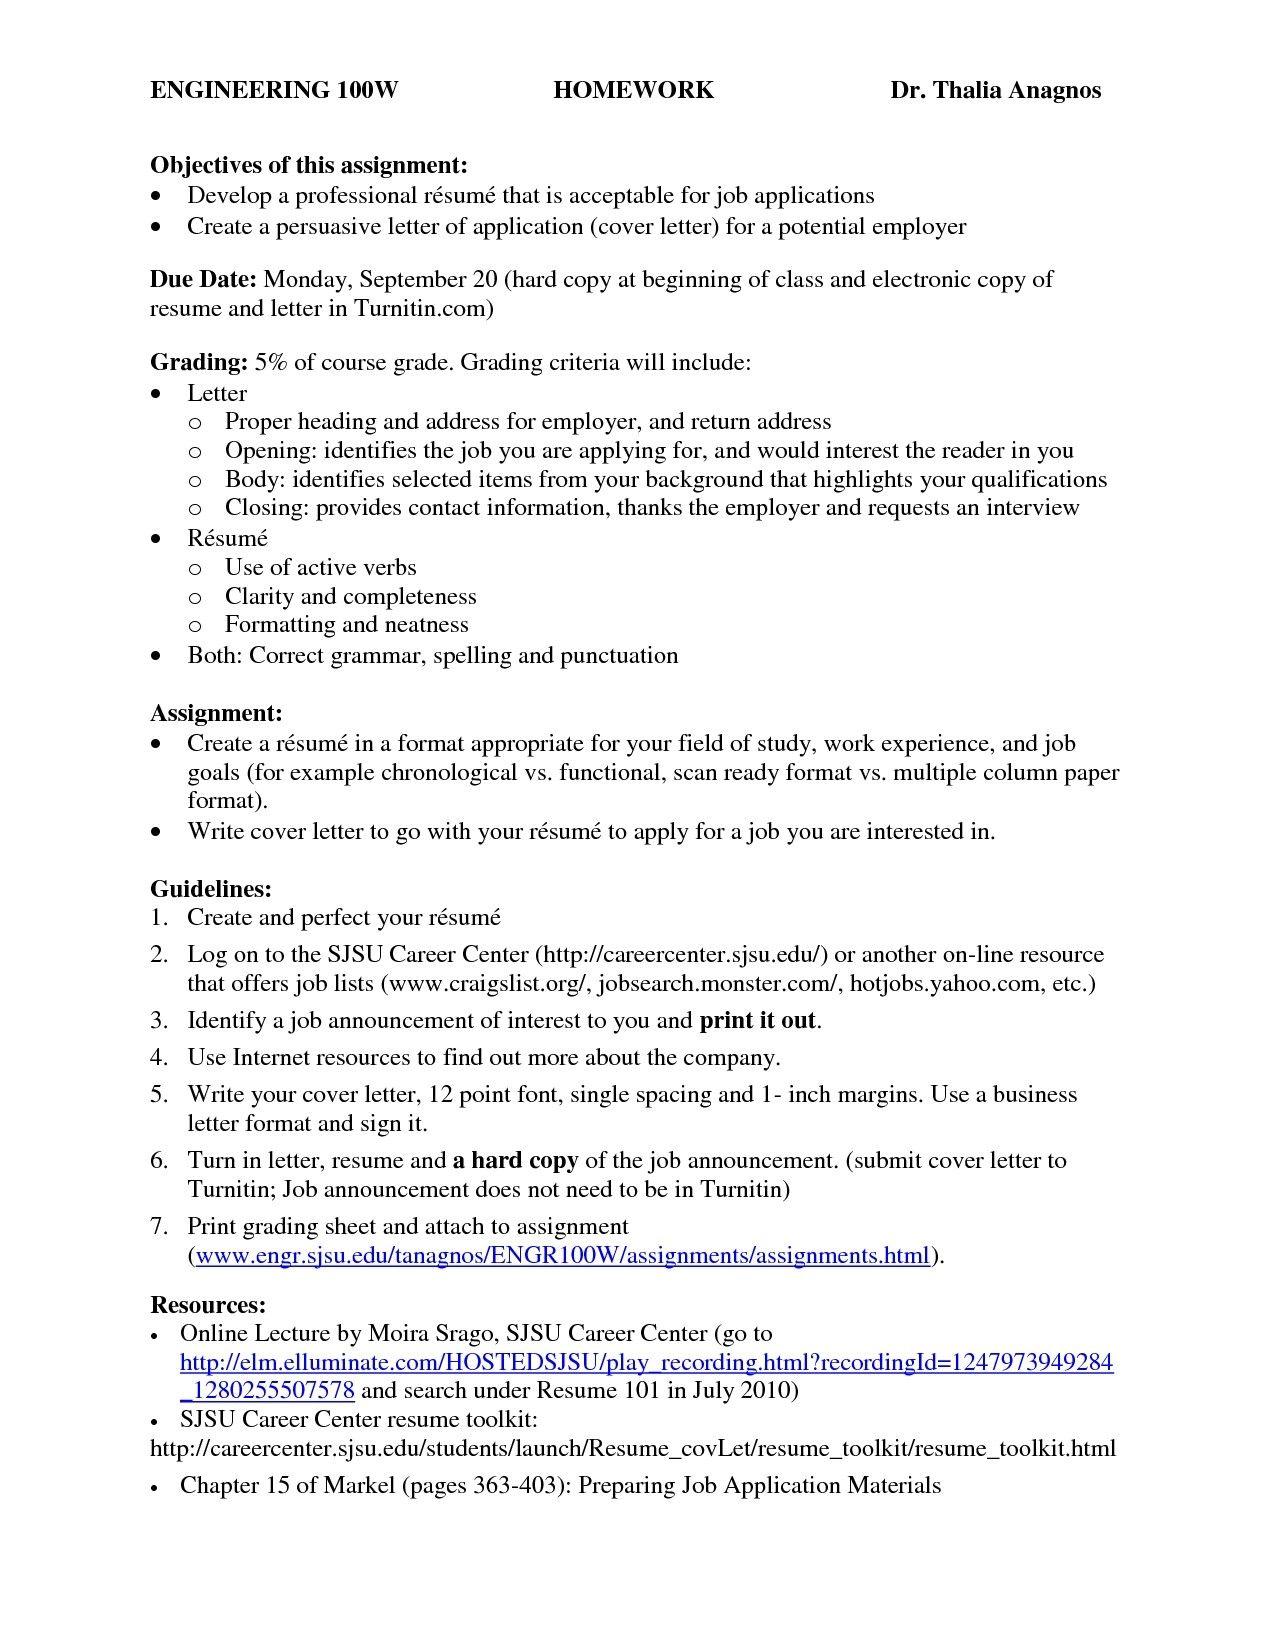 Resume Format Purdue Owl Template Persuasive Letter Cv Apa Book